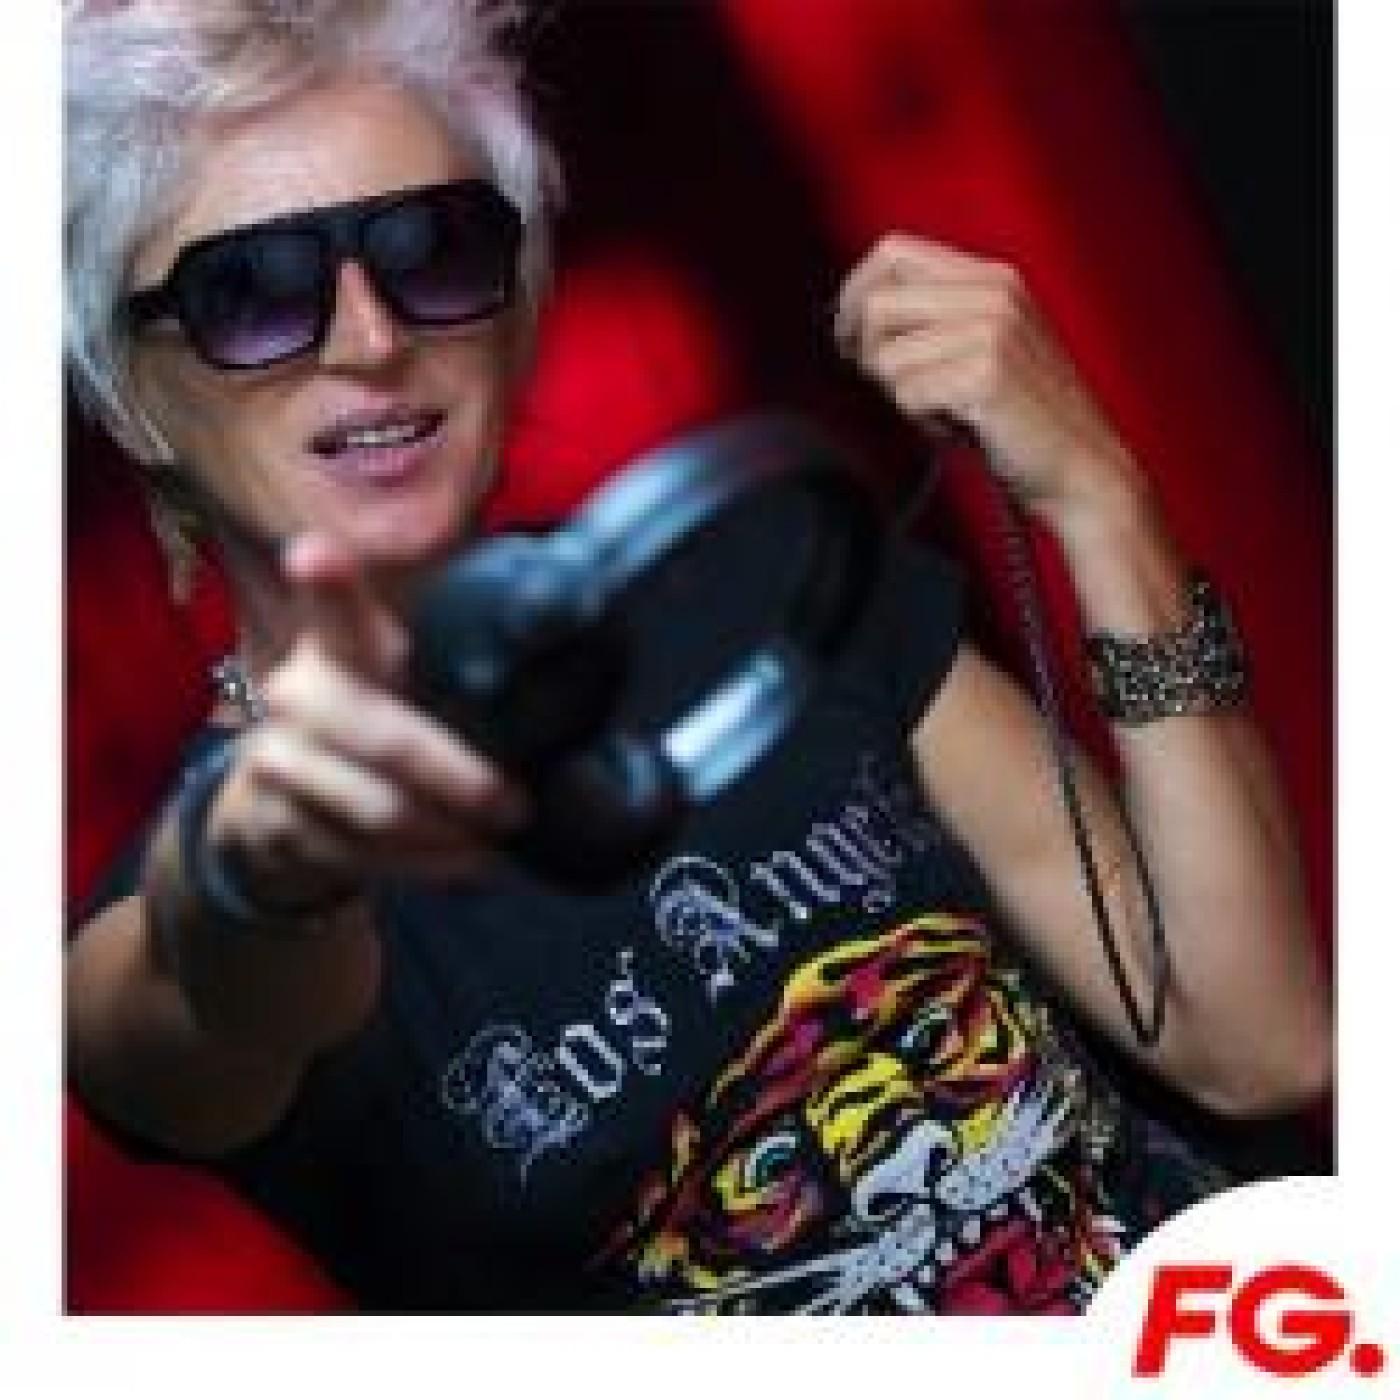 CLUB FG : BENJI DE LA HOUSE